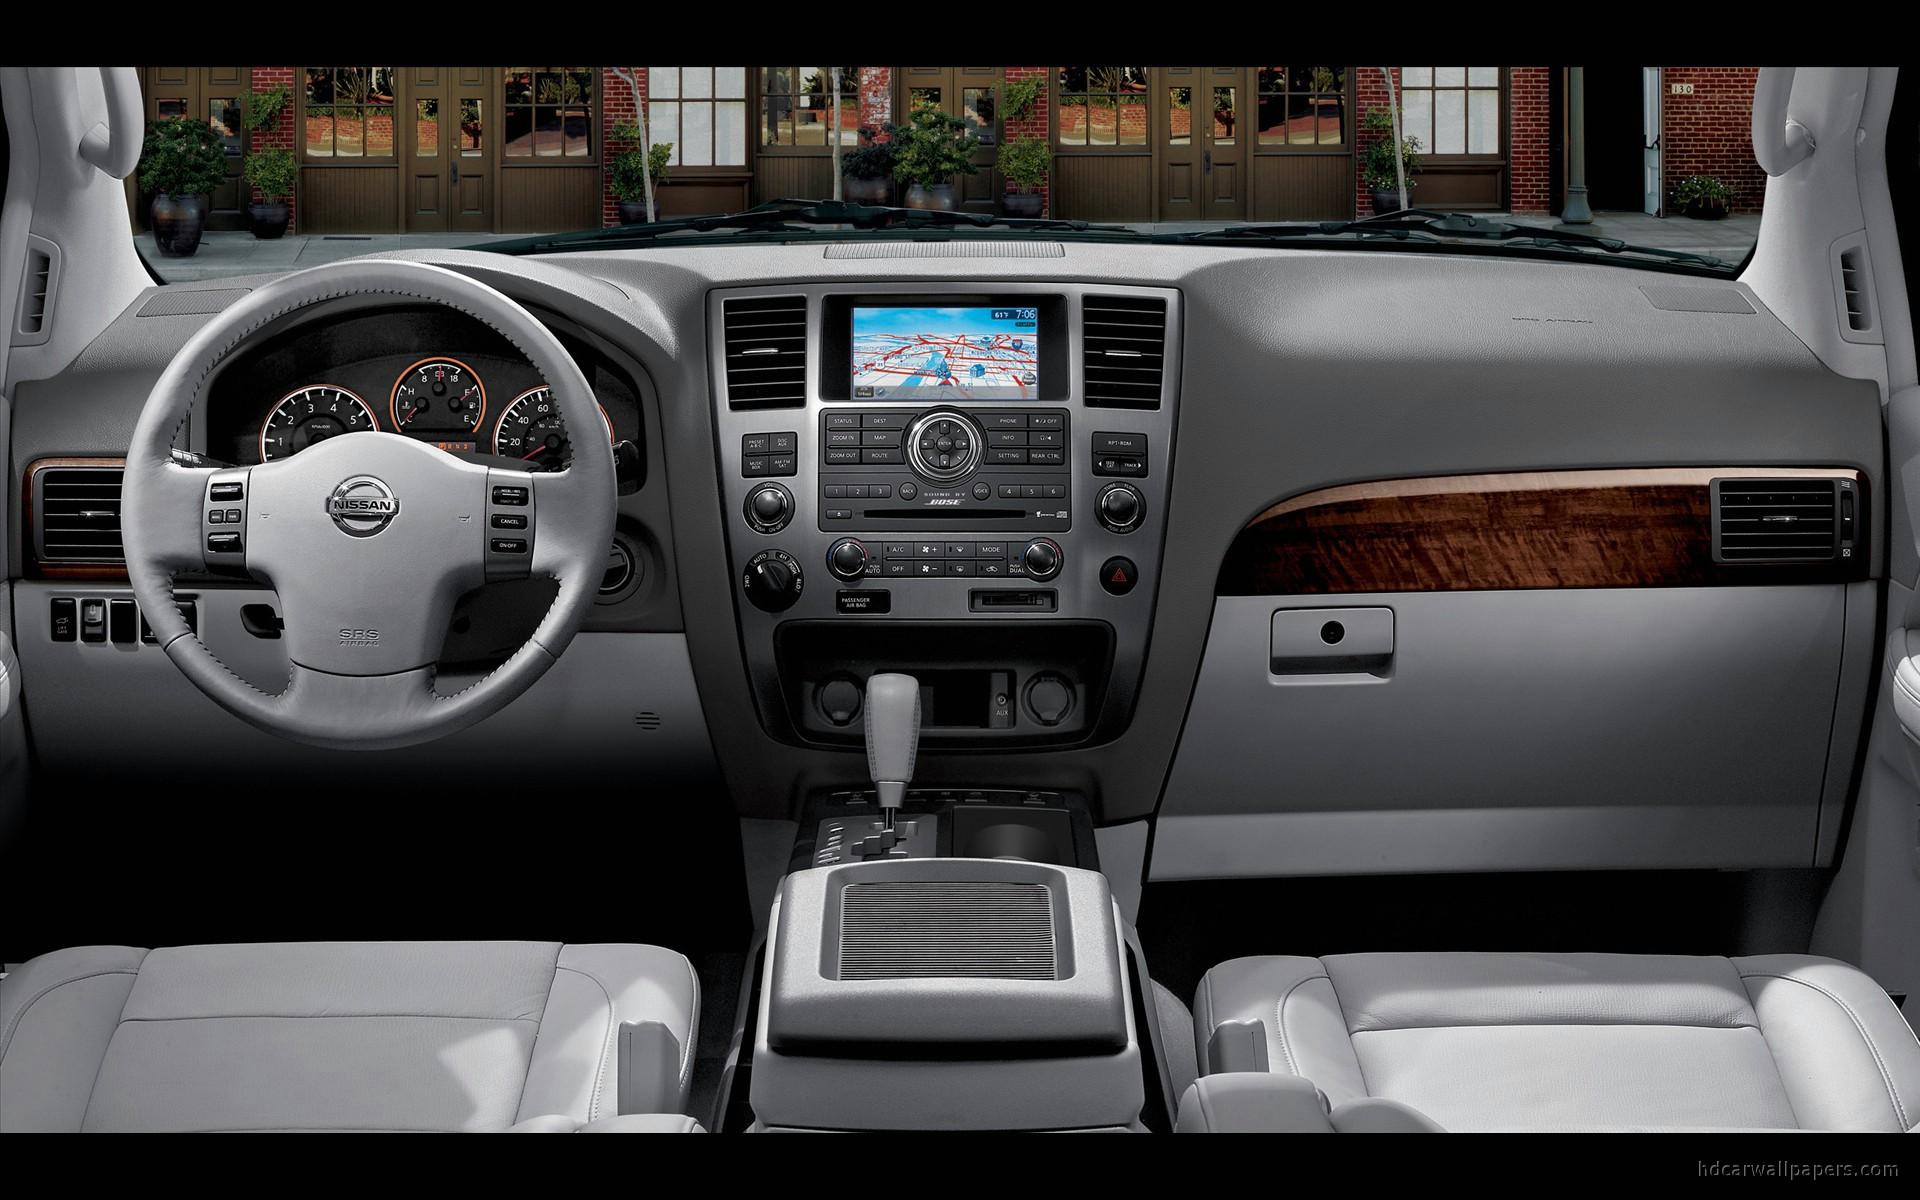 2010 Nissan Armada Interior Wallpaper | HD Car Wallpapers ...